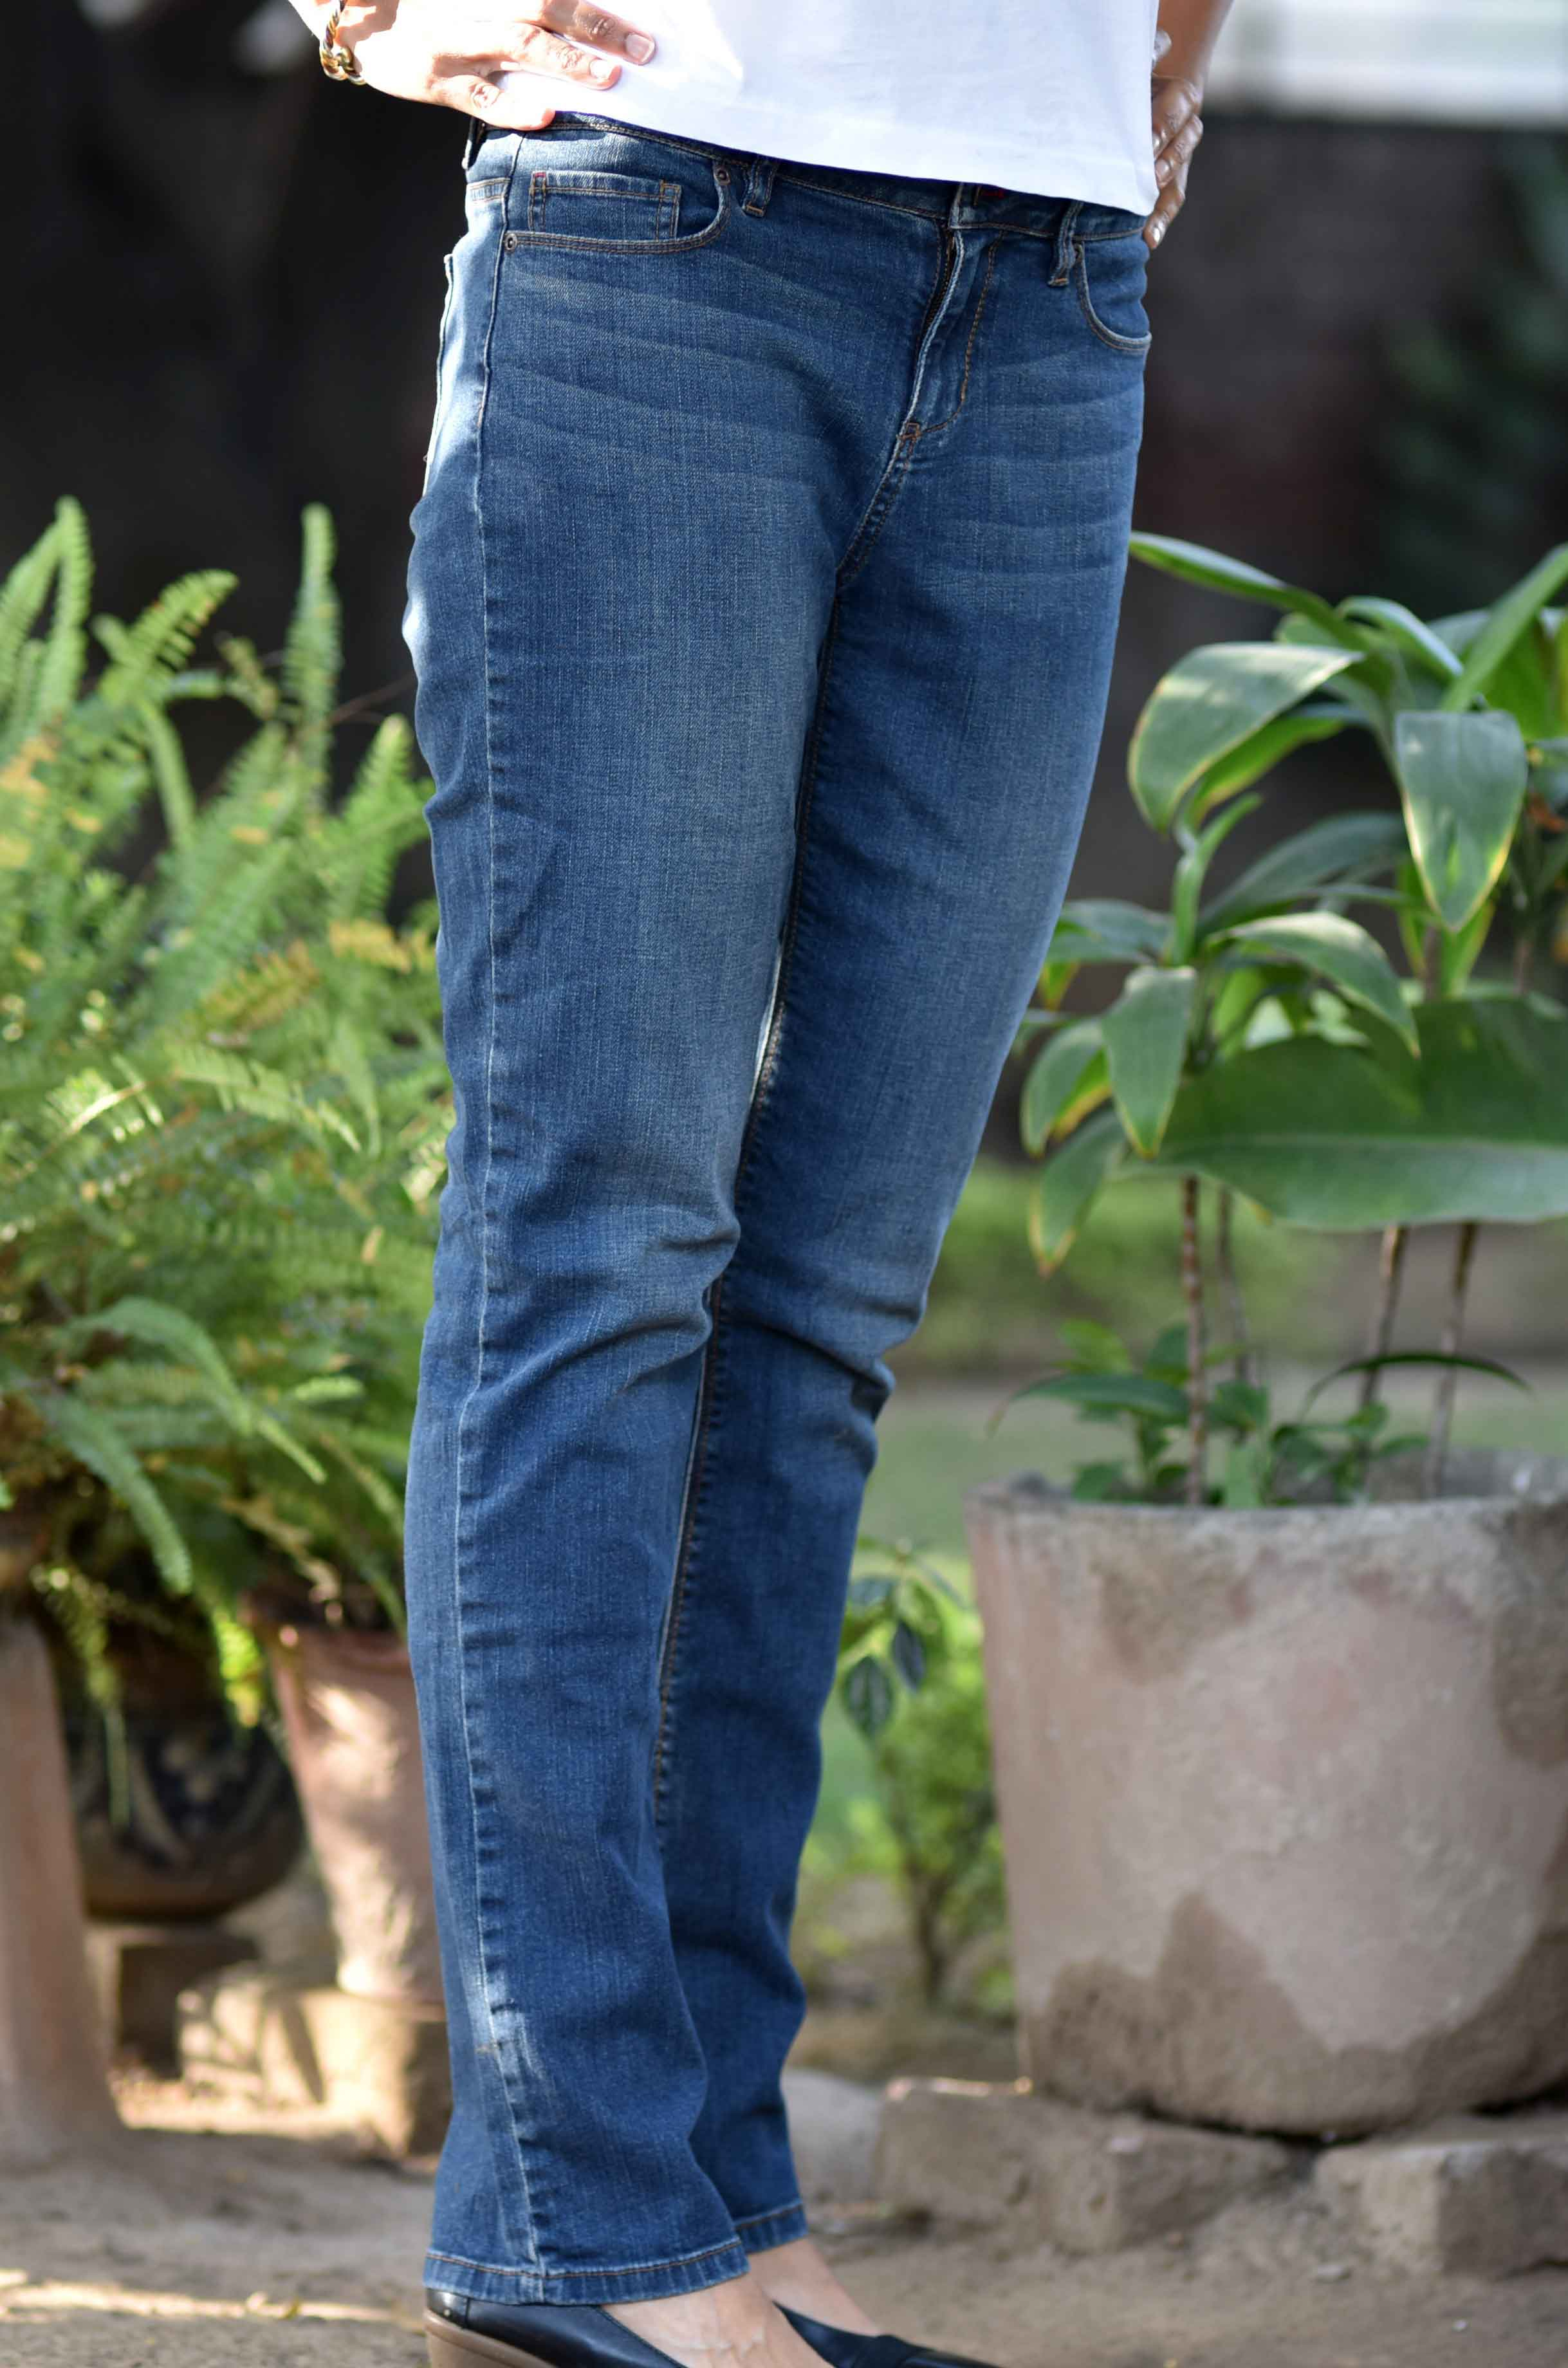 The JJill Authentic Fit Slim Leg Jeans, image©gunjanvirk.